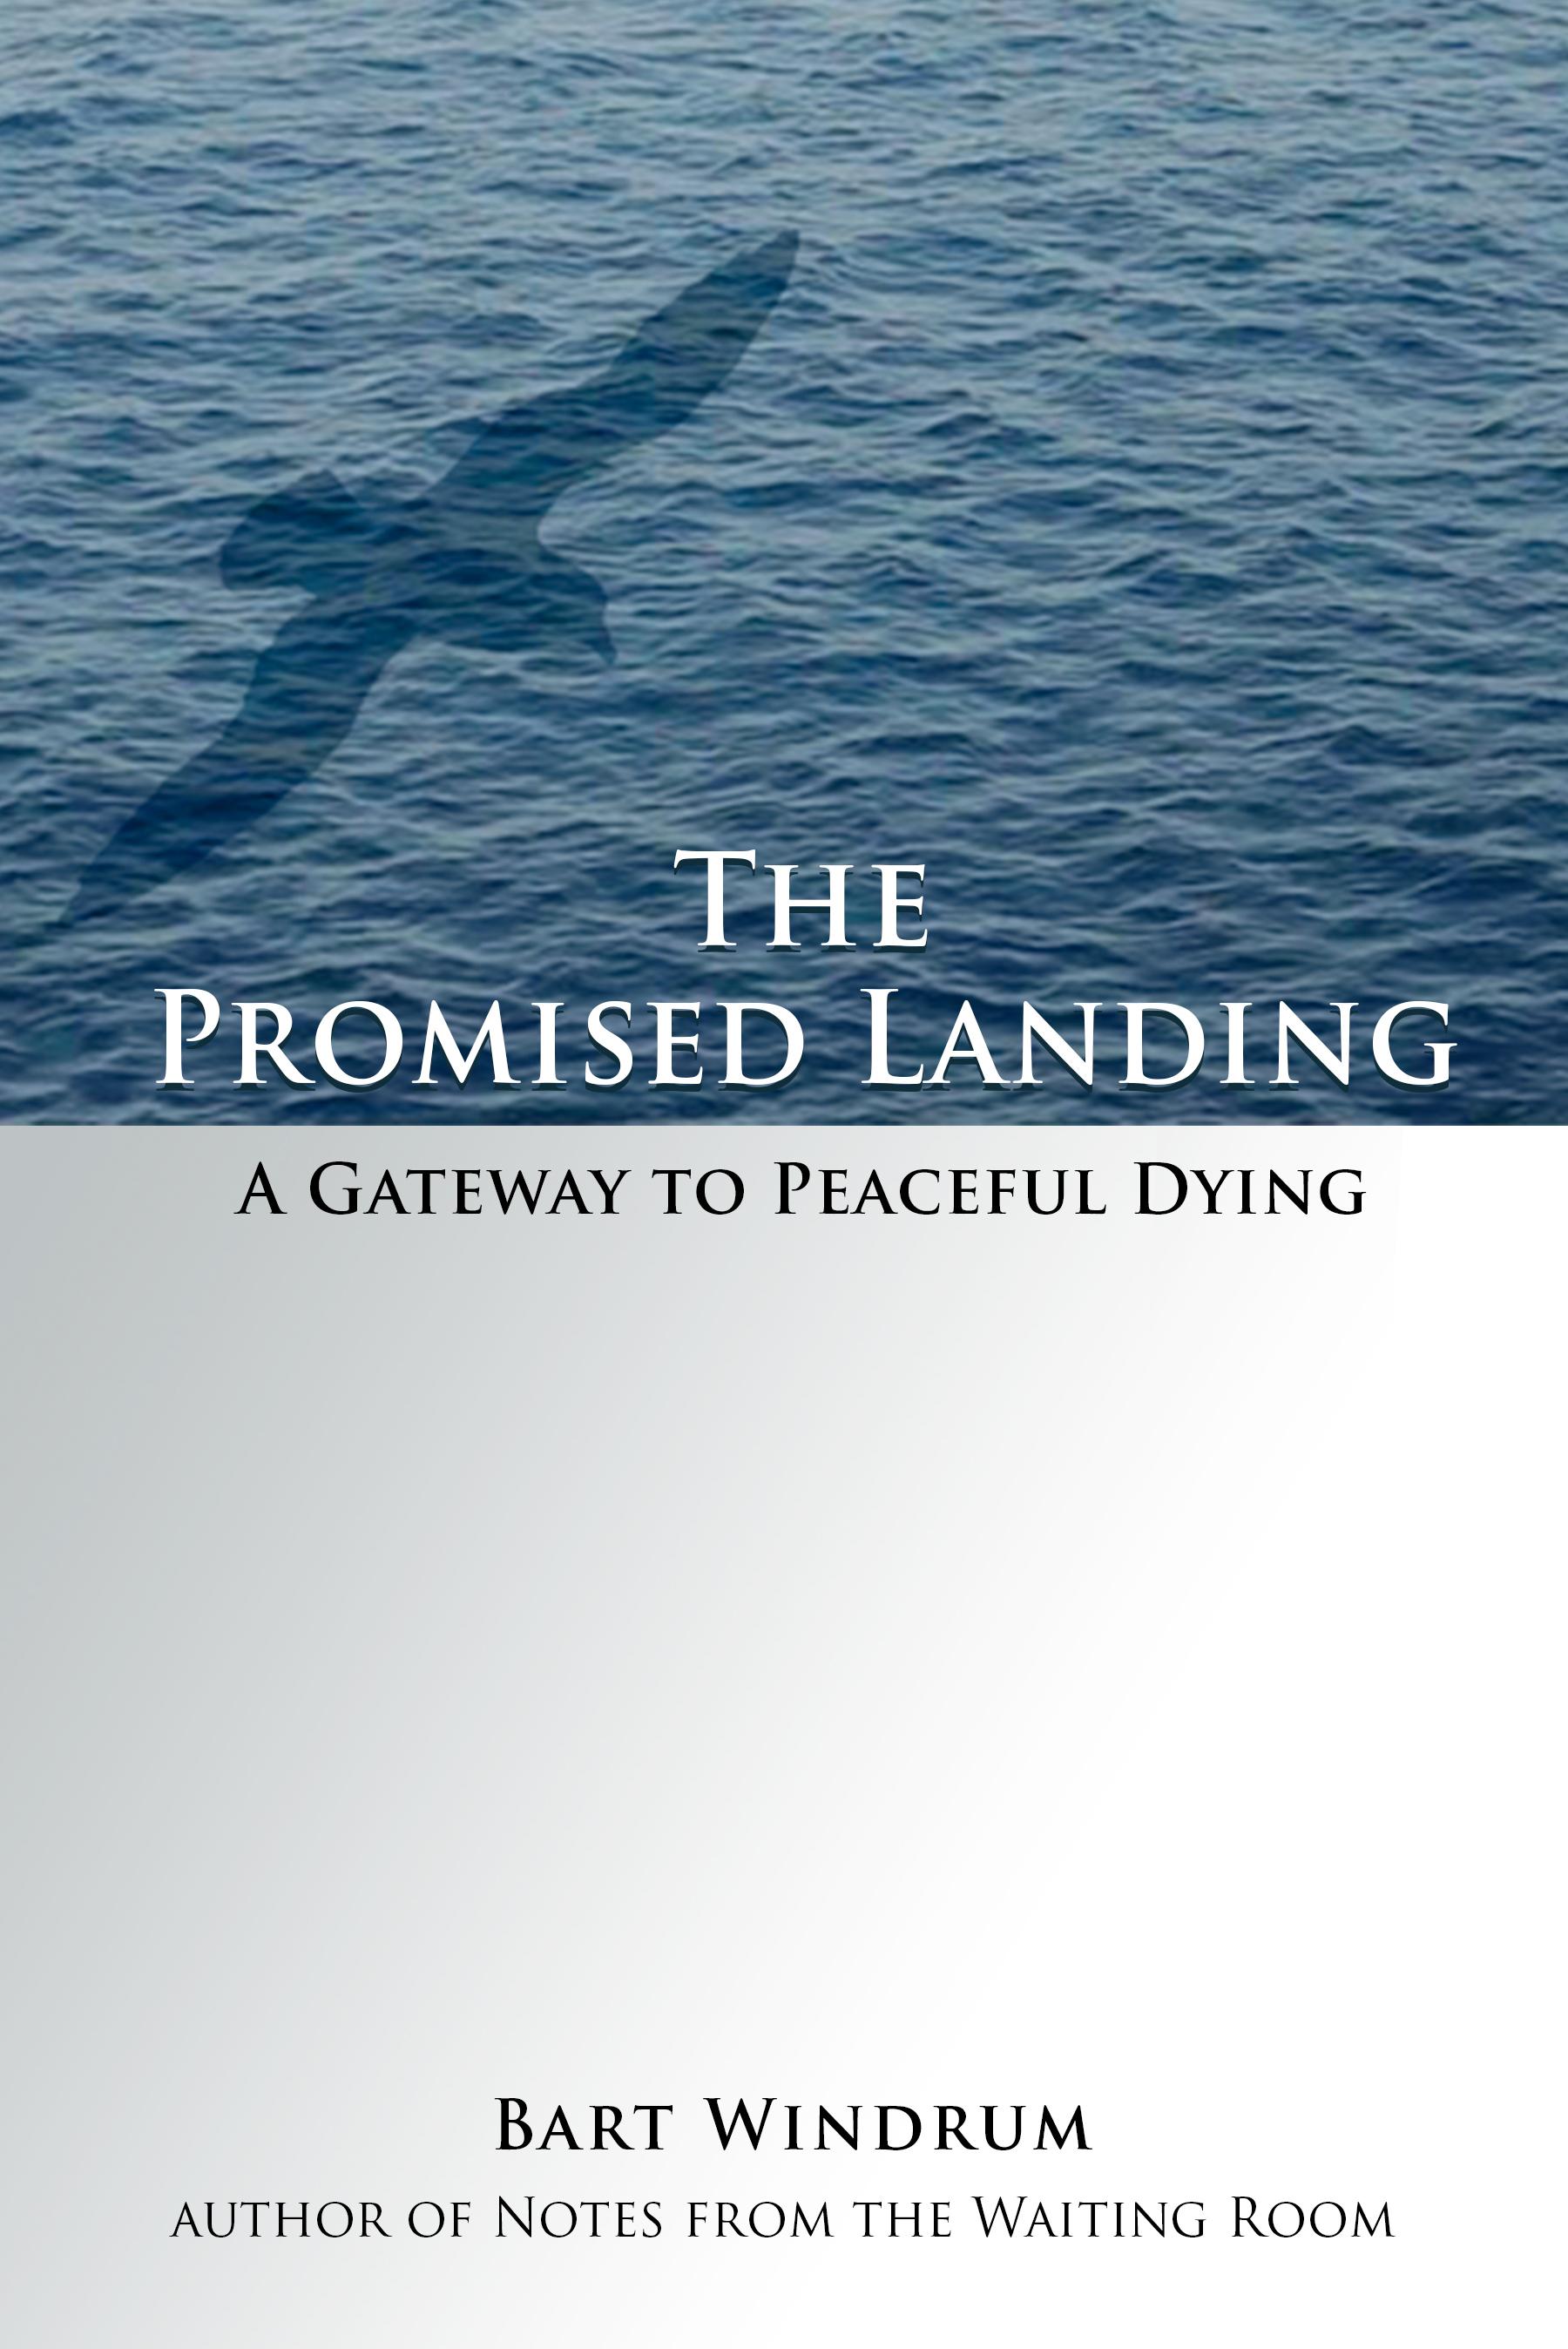 PromisedLandingCover